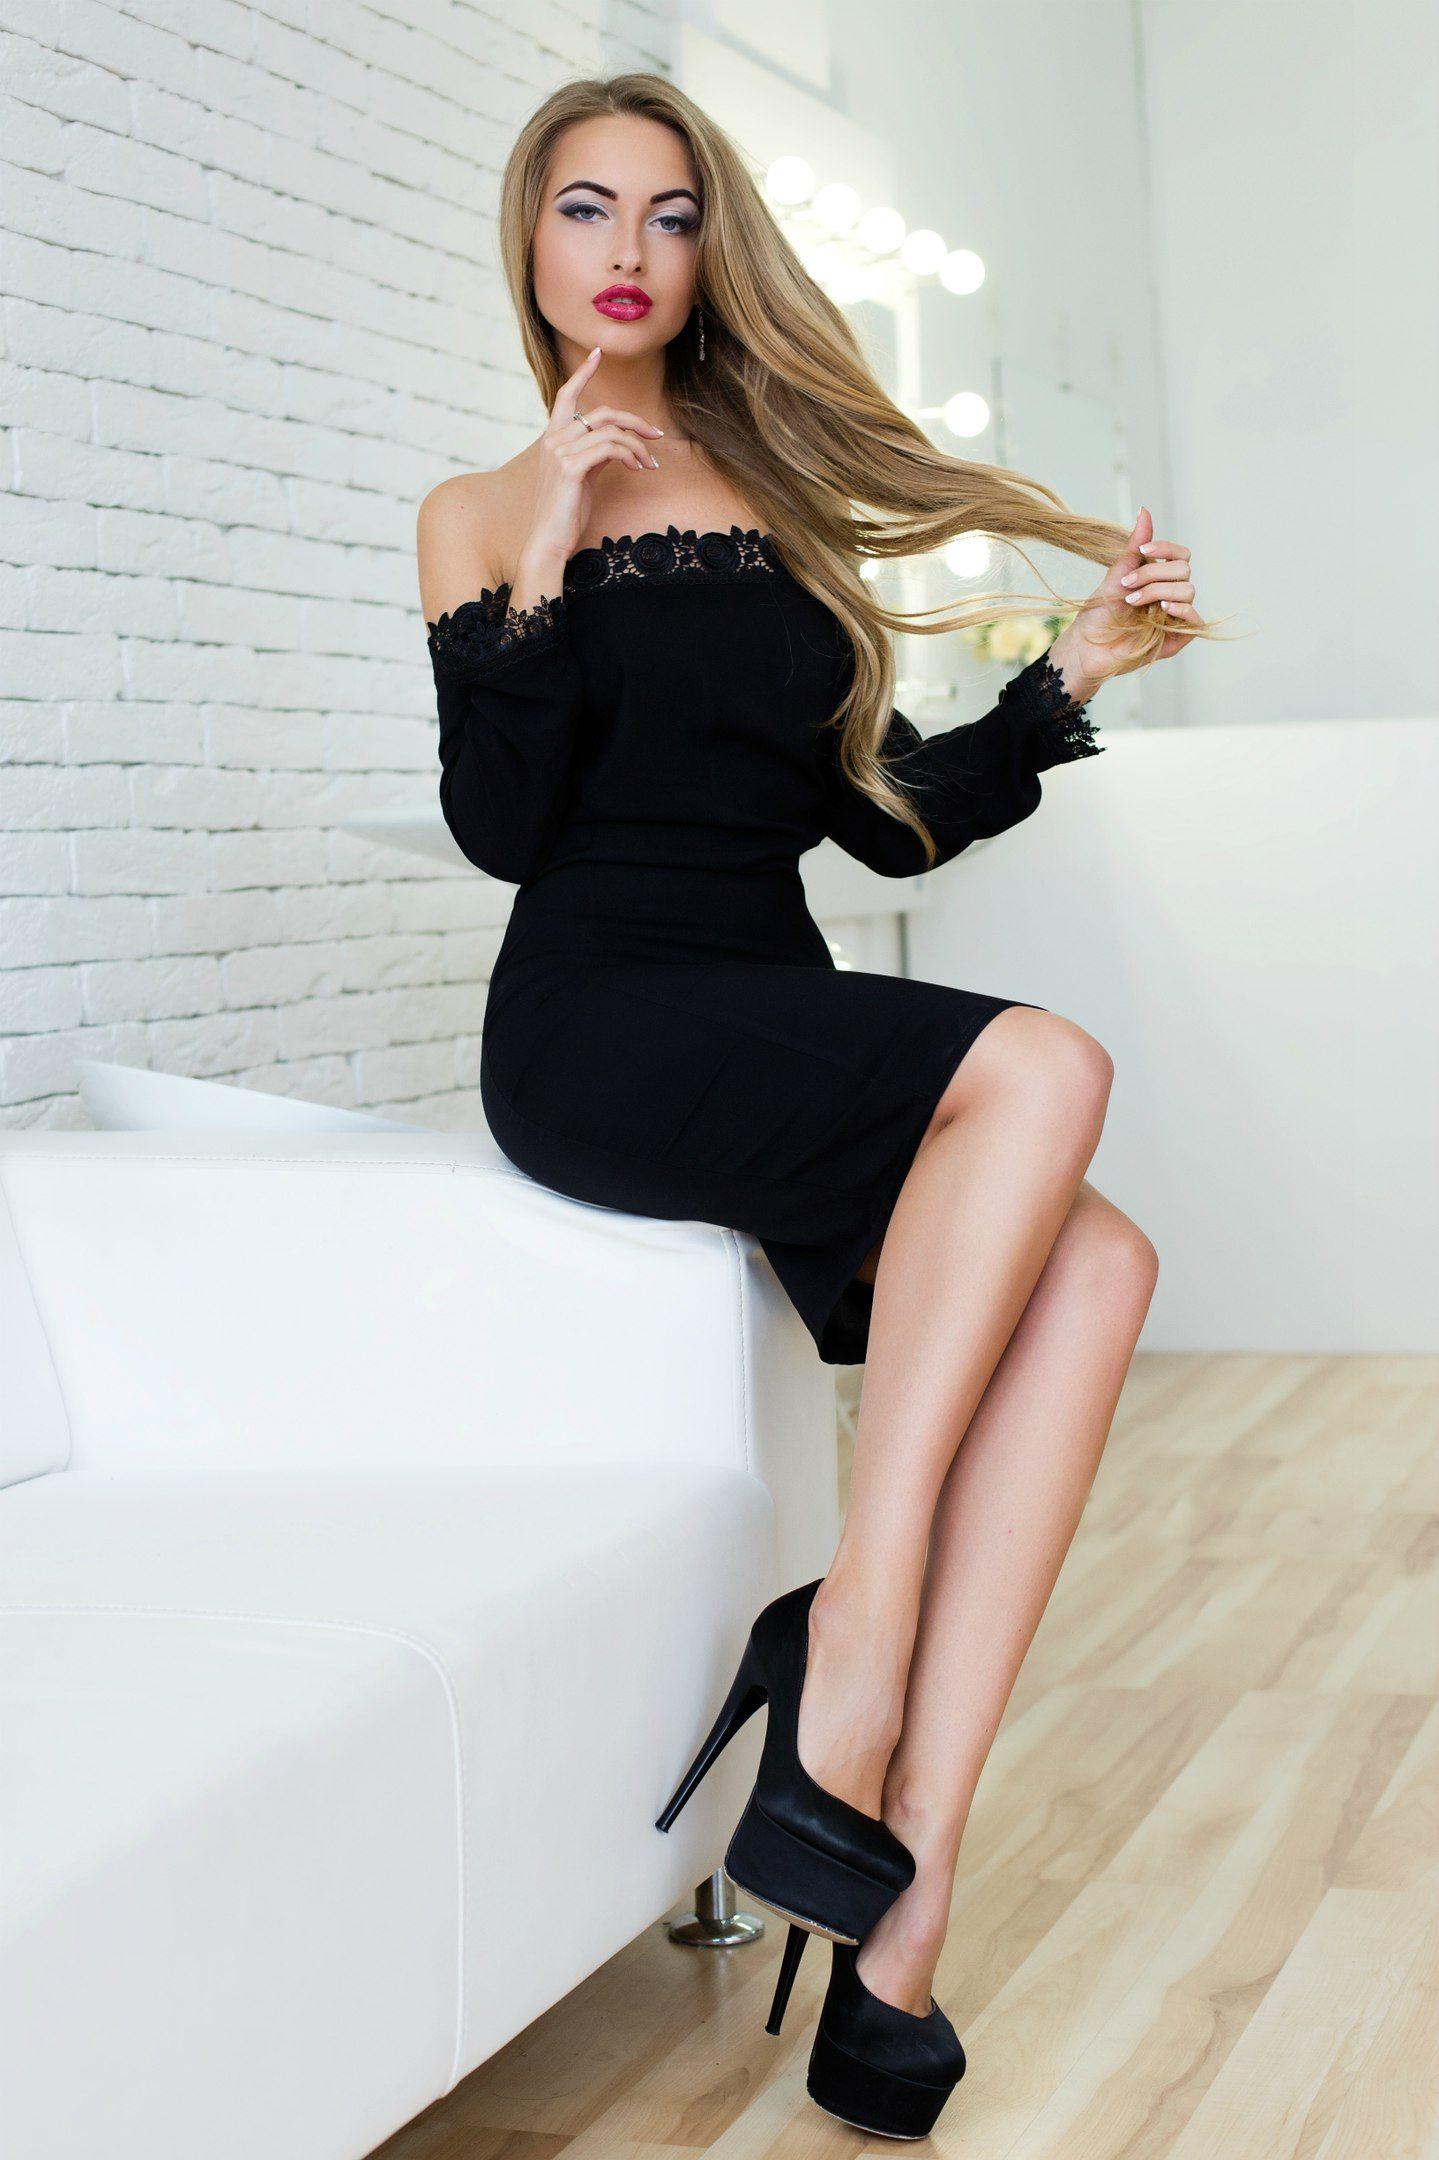 Alina Kosilova Little Dresses, Lust, Classy, High Heels, Style, Sexy  Lingerie 9ff042acfb